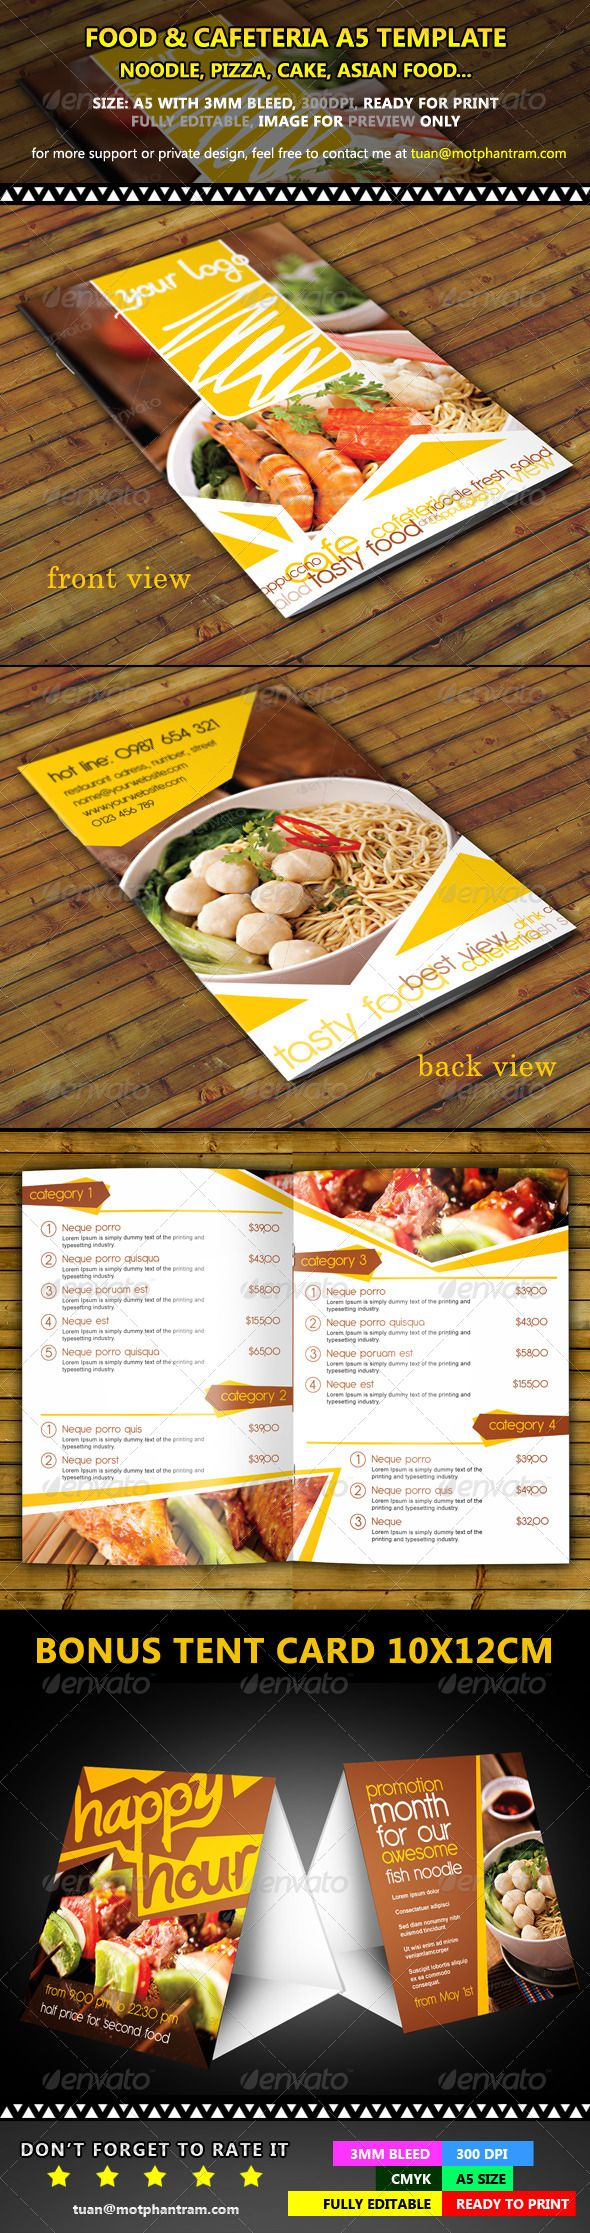 Restaurant Menu A5 Fold Vol 1 - Food Menus Print Templates Download here : http://graphicriver.net/item/restaurant-menu-a5-fold-vol-1/4579638?s_rank=1376&ref=Al-fatih